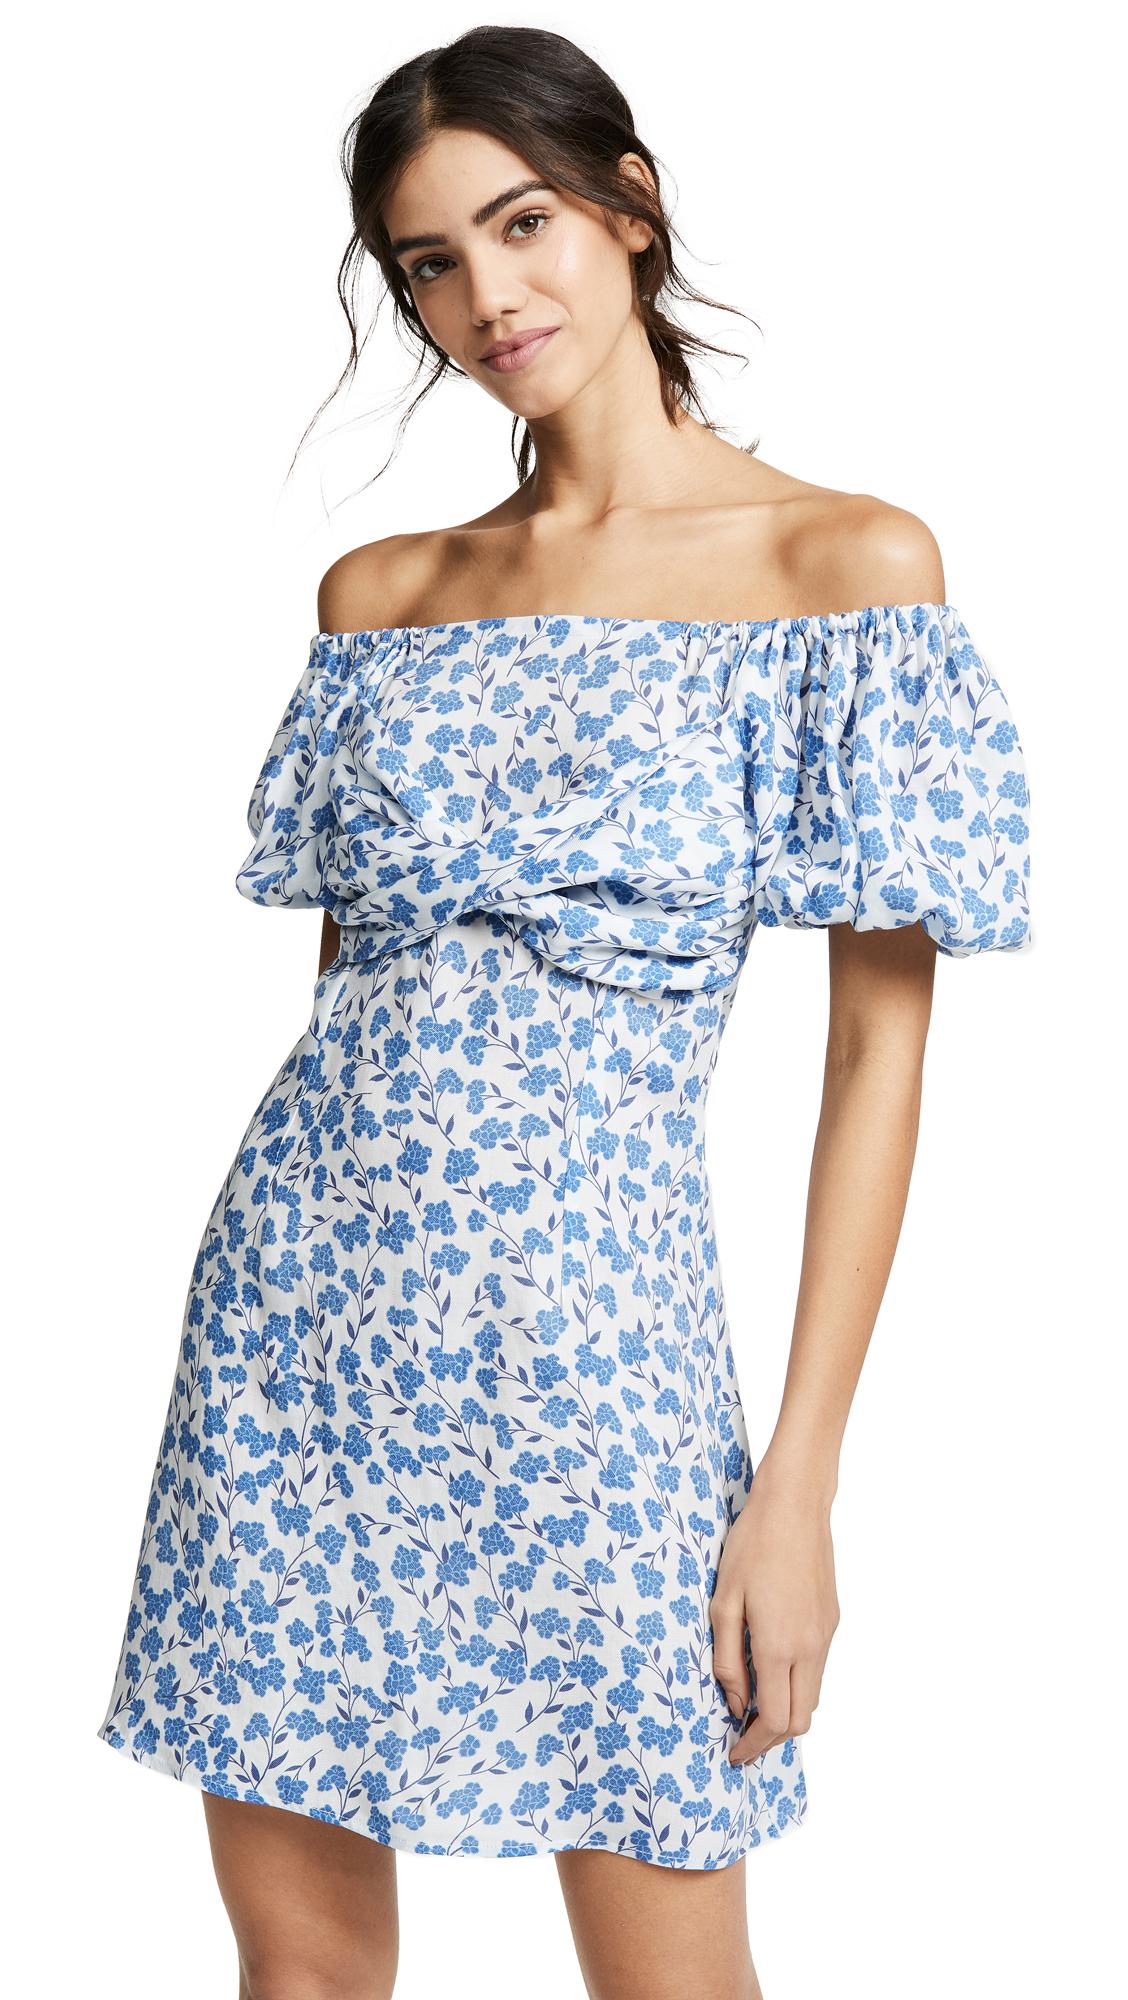 6 SHORE ROAD Sea Mini Dress in Blue Floral